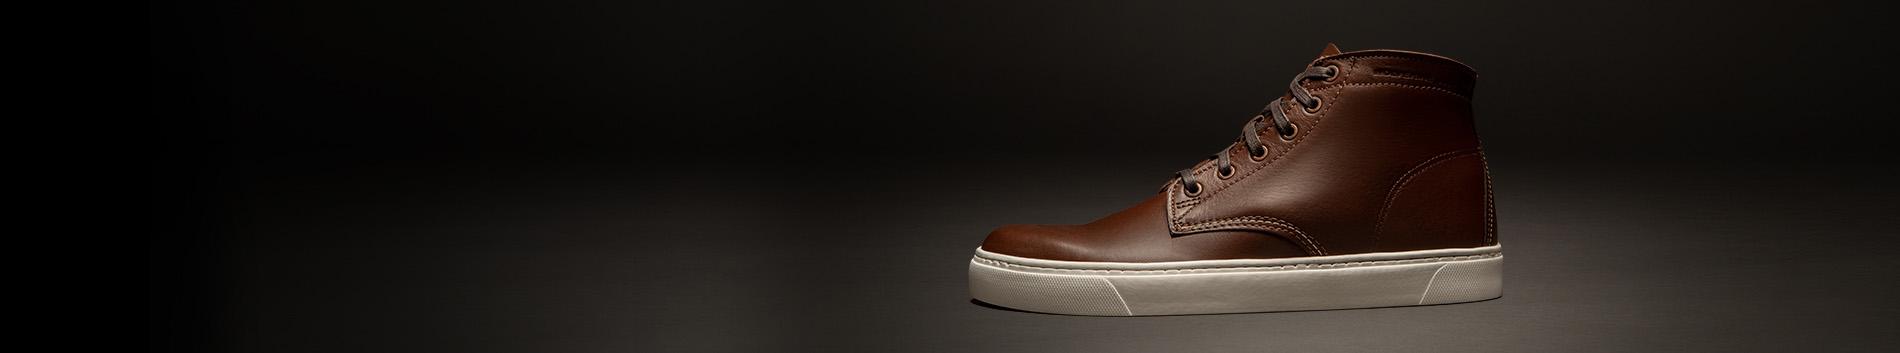 ff0589d84f819 Wolverine 1000 Mile & 1883 Vintage Boots | Wolverine